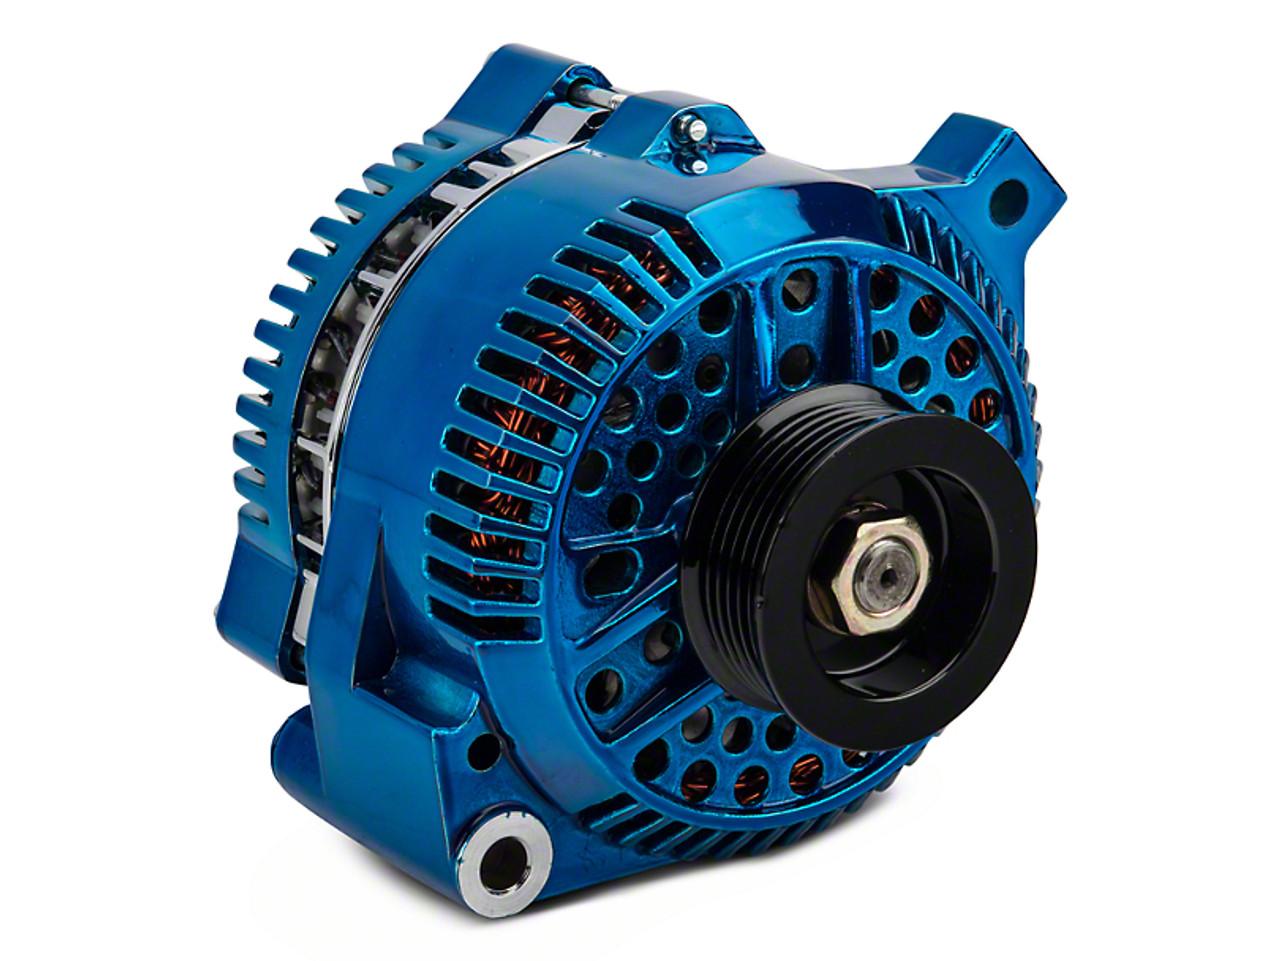 130a 3g alternator (1619) - pa performance com mustang g alternator wiring  diagram